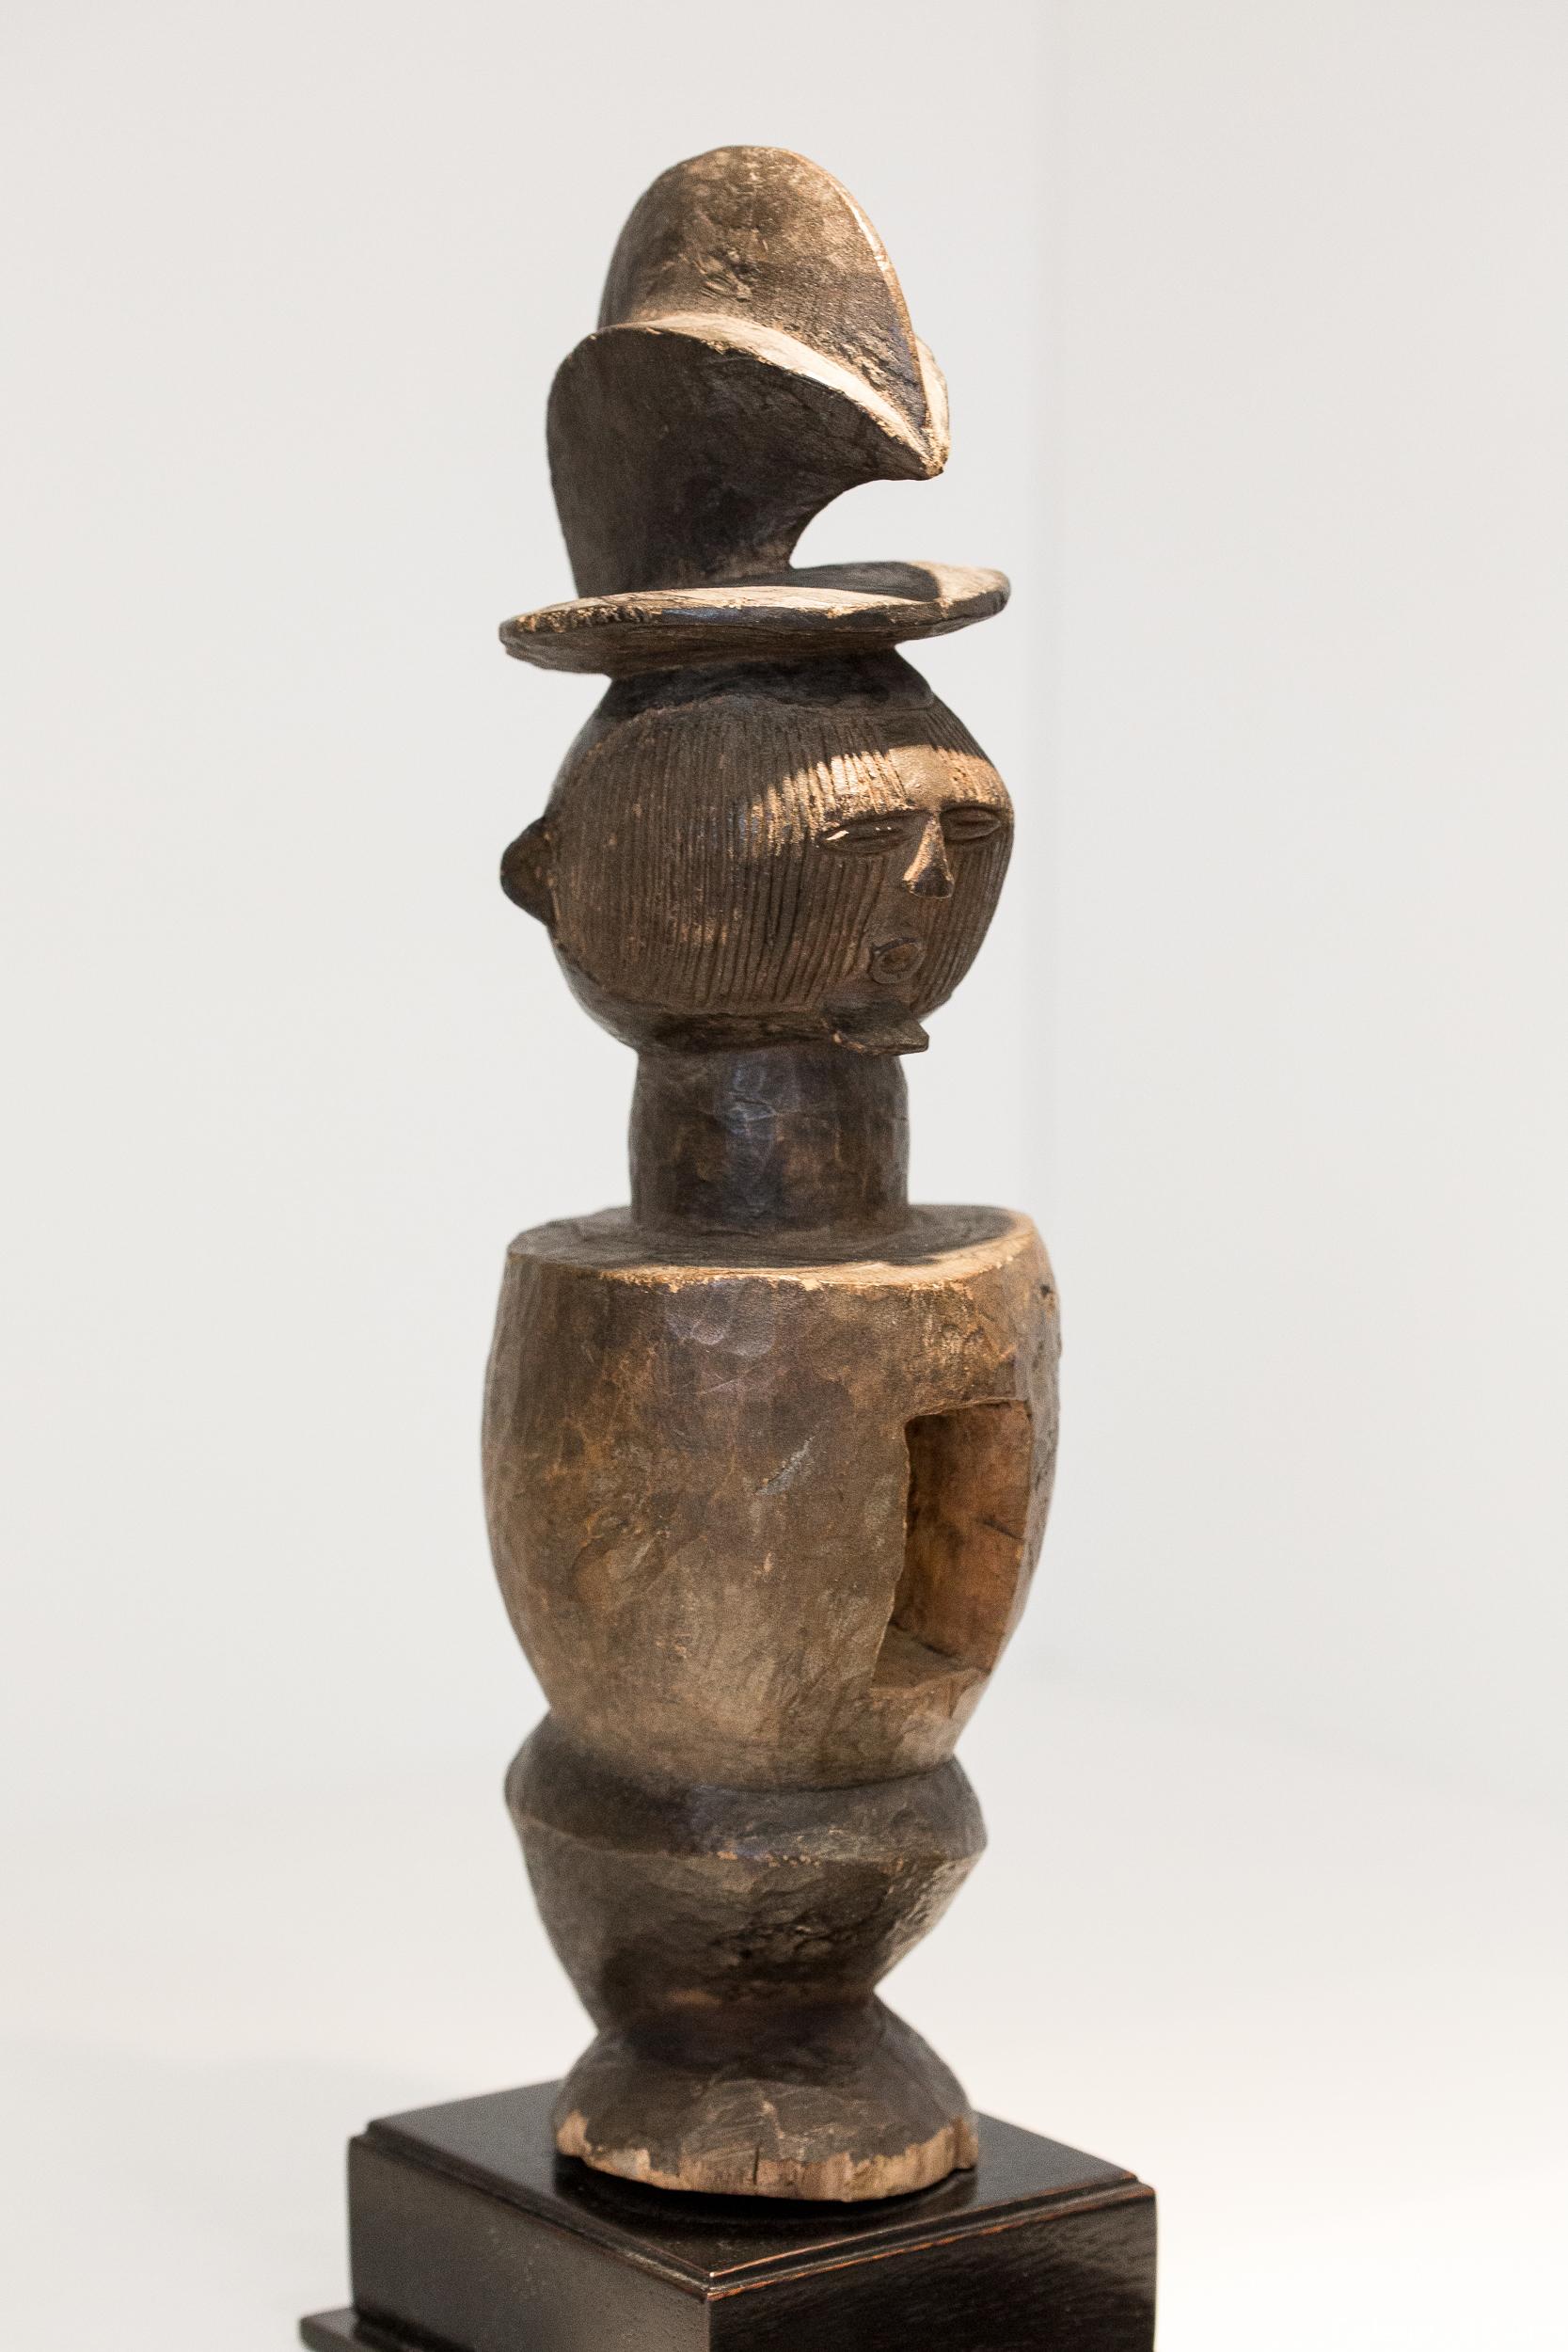 tribal-art-oostende-ostende-exposition-galerie-lz-art-africain-belgique-12.jpg